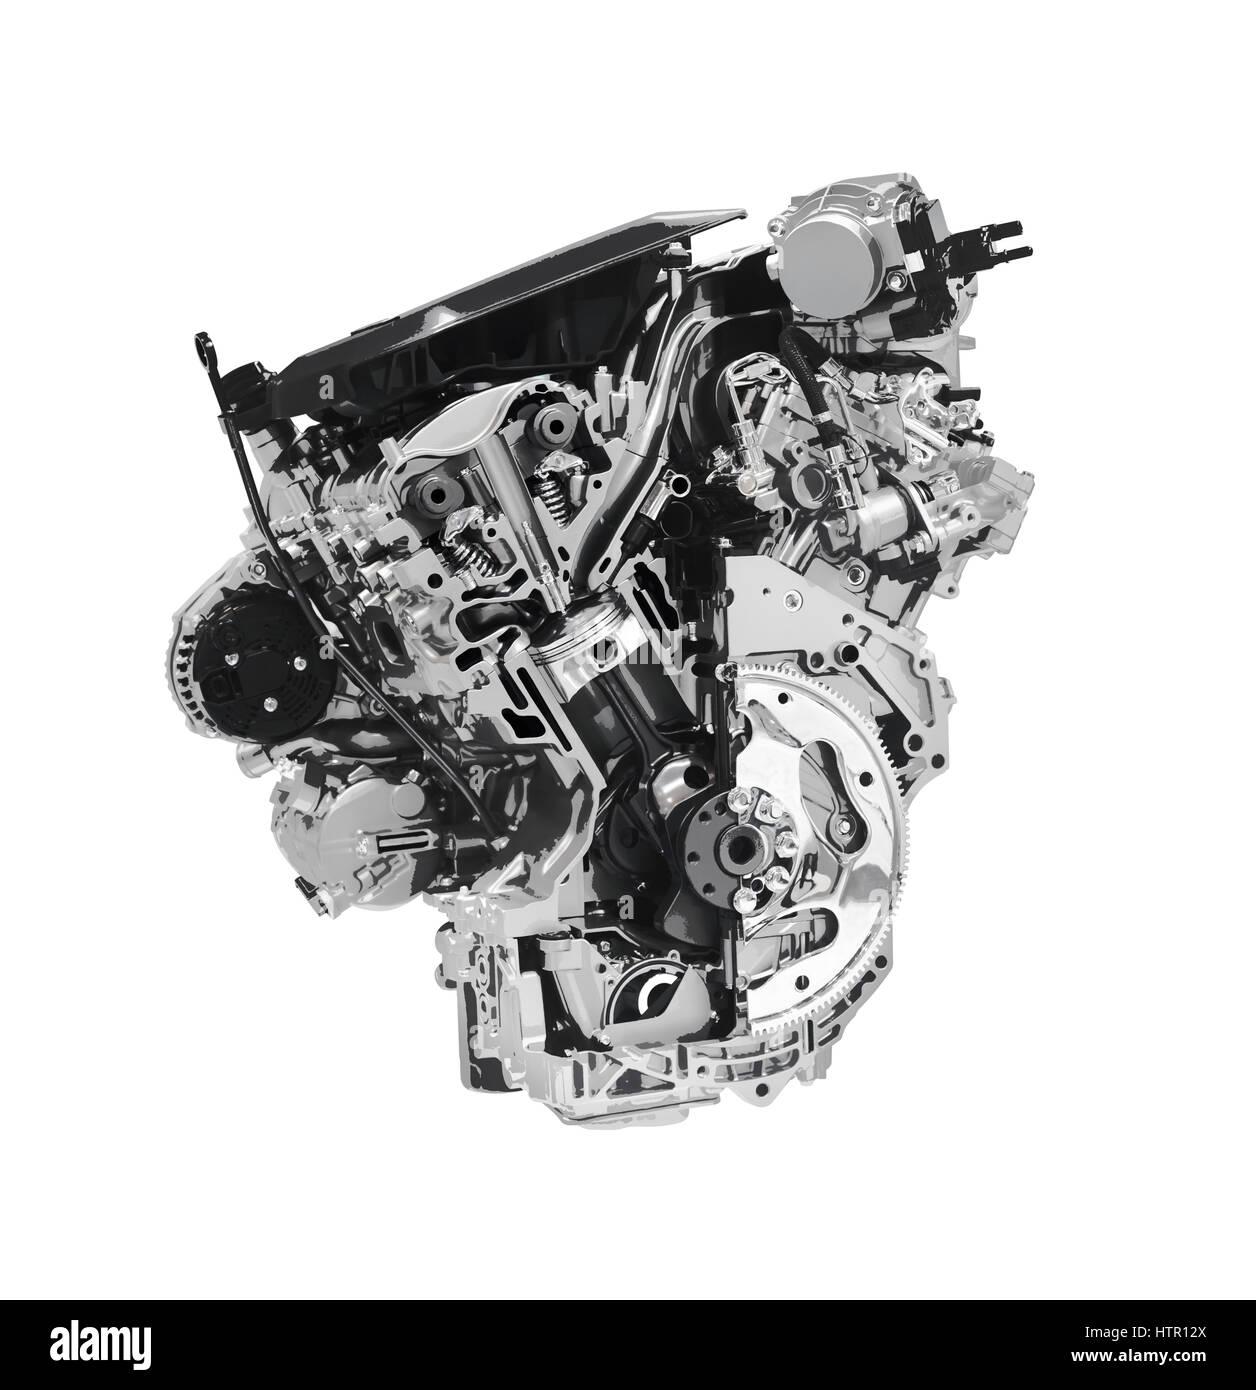 Showing Engine Detail Stockfotos & Showing Engine Detail Bilder - Alamy